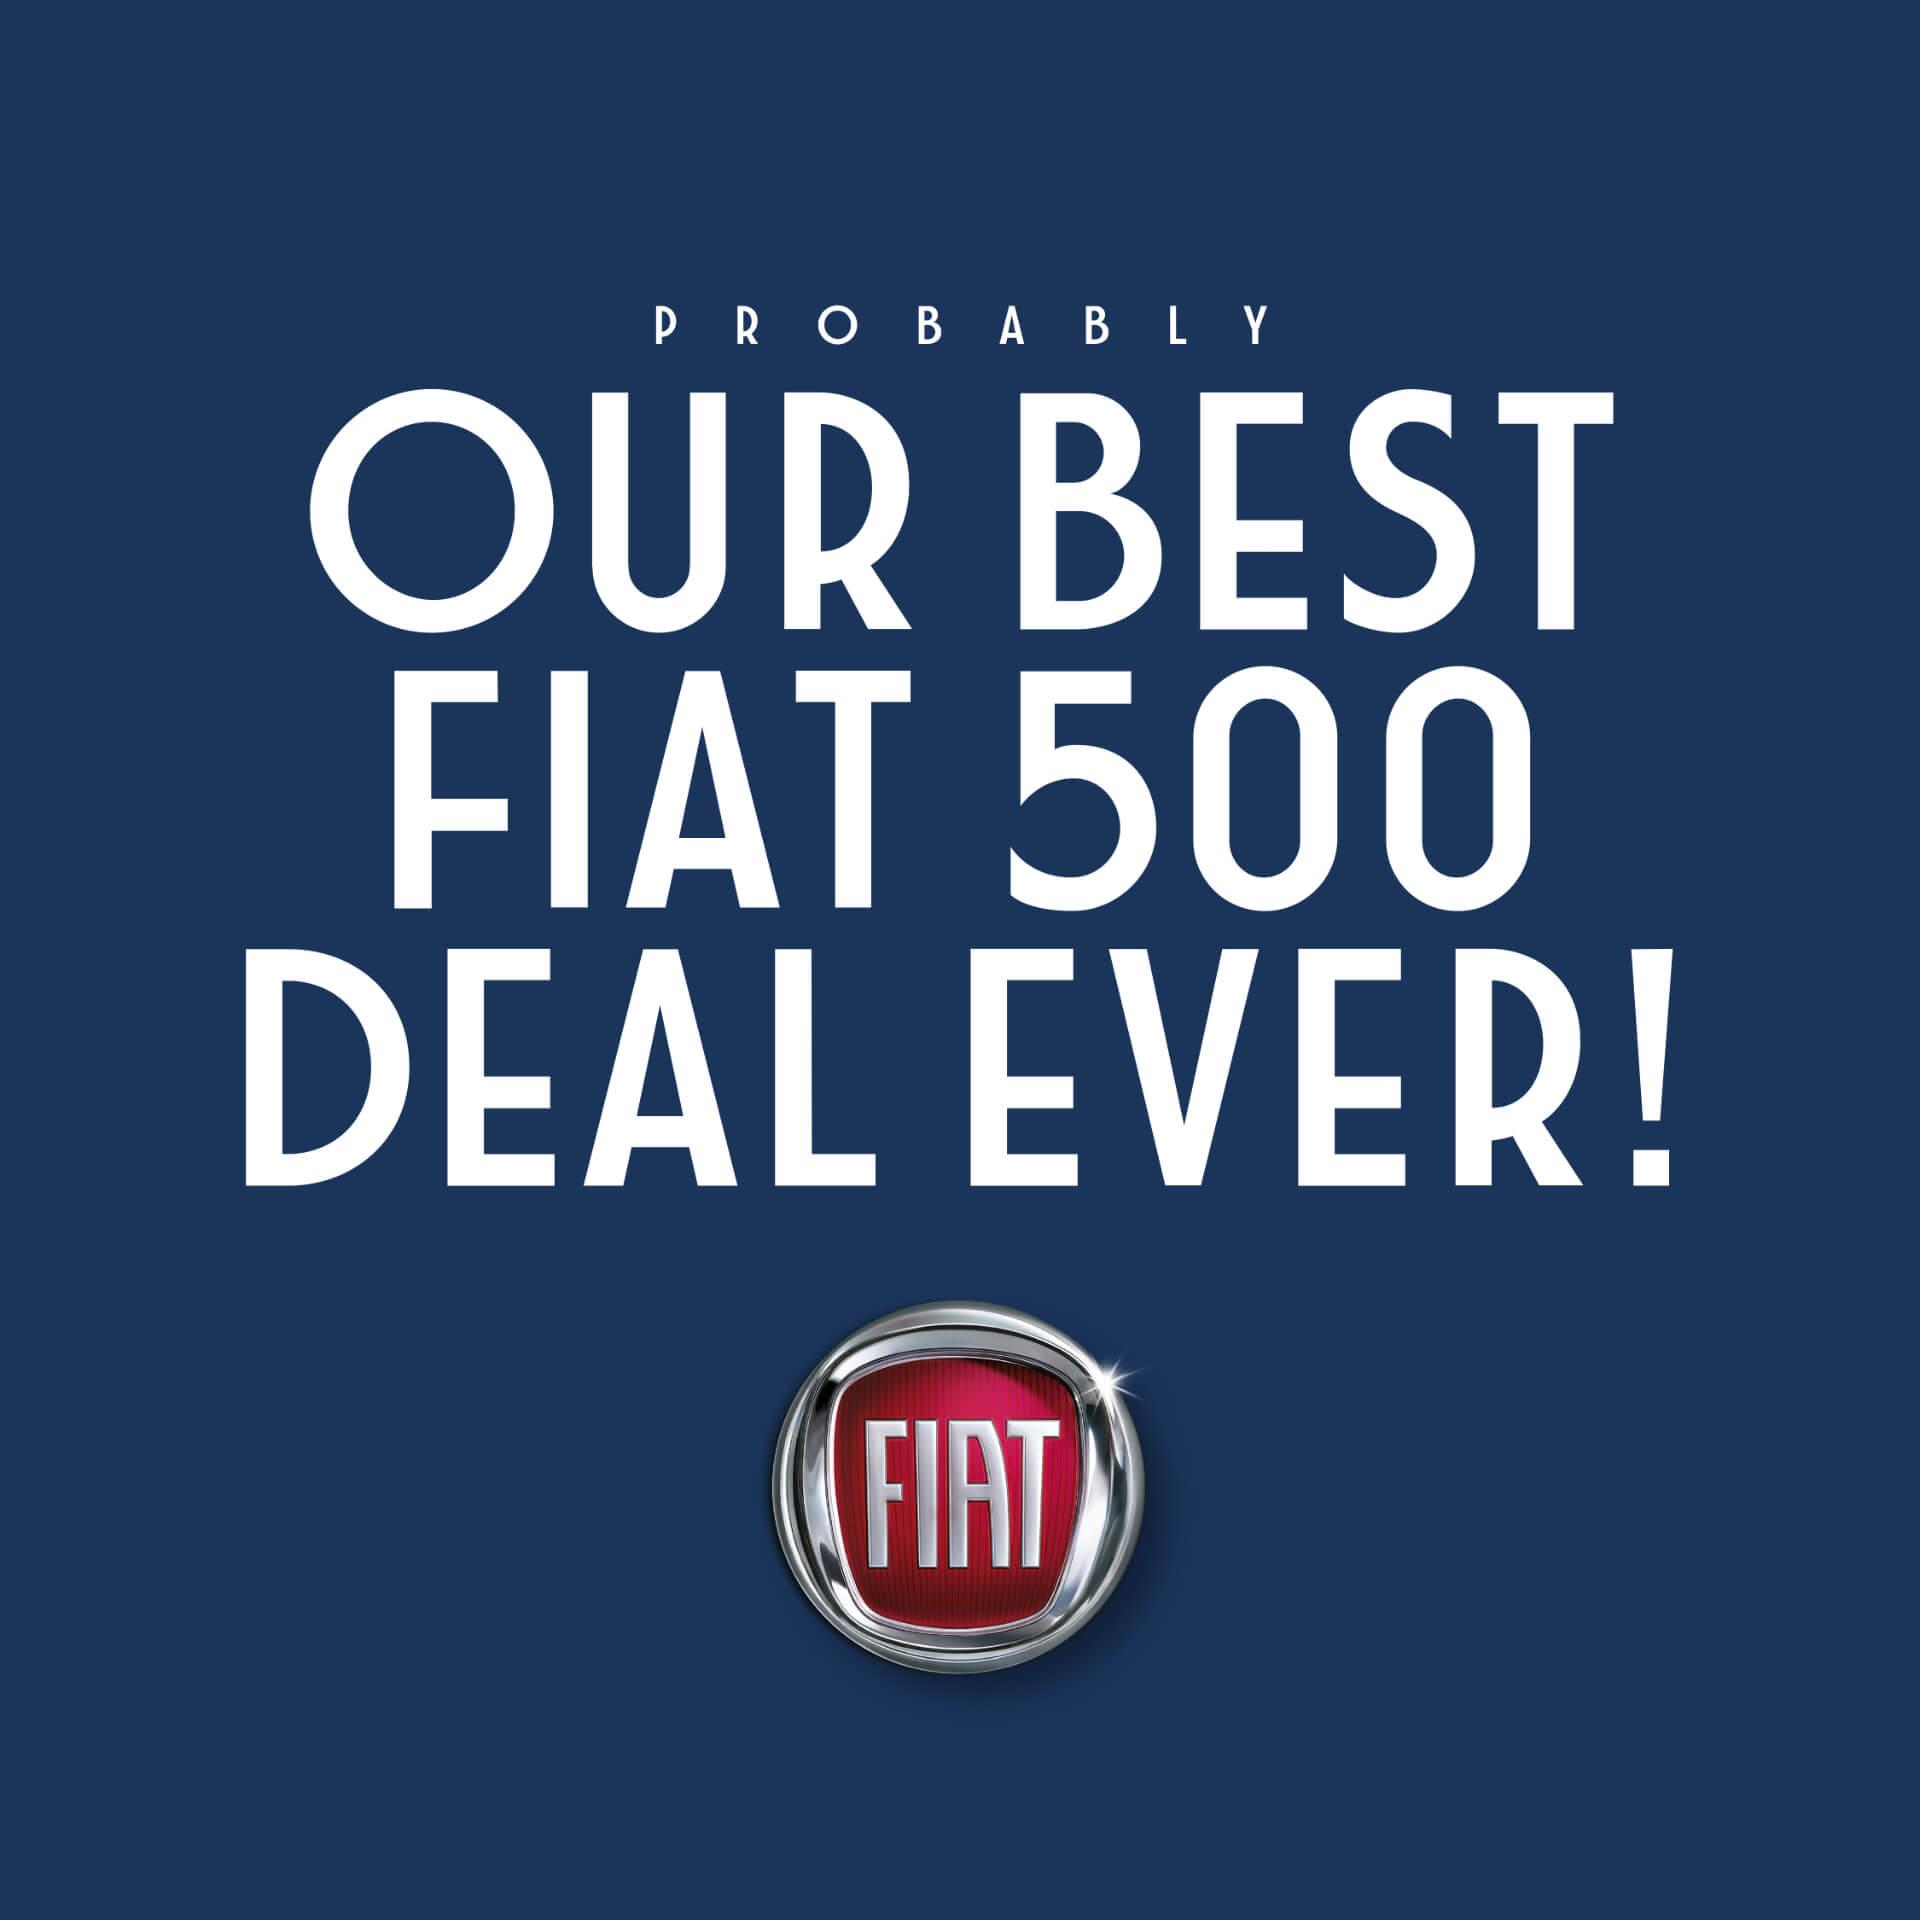 Fiat 500 Facebook Advert Artwork